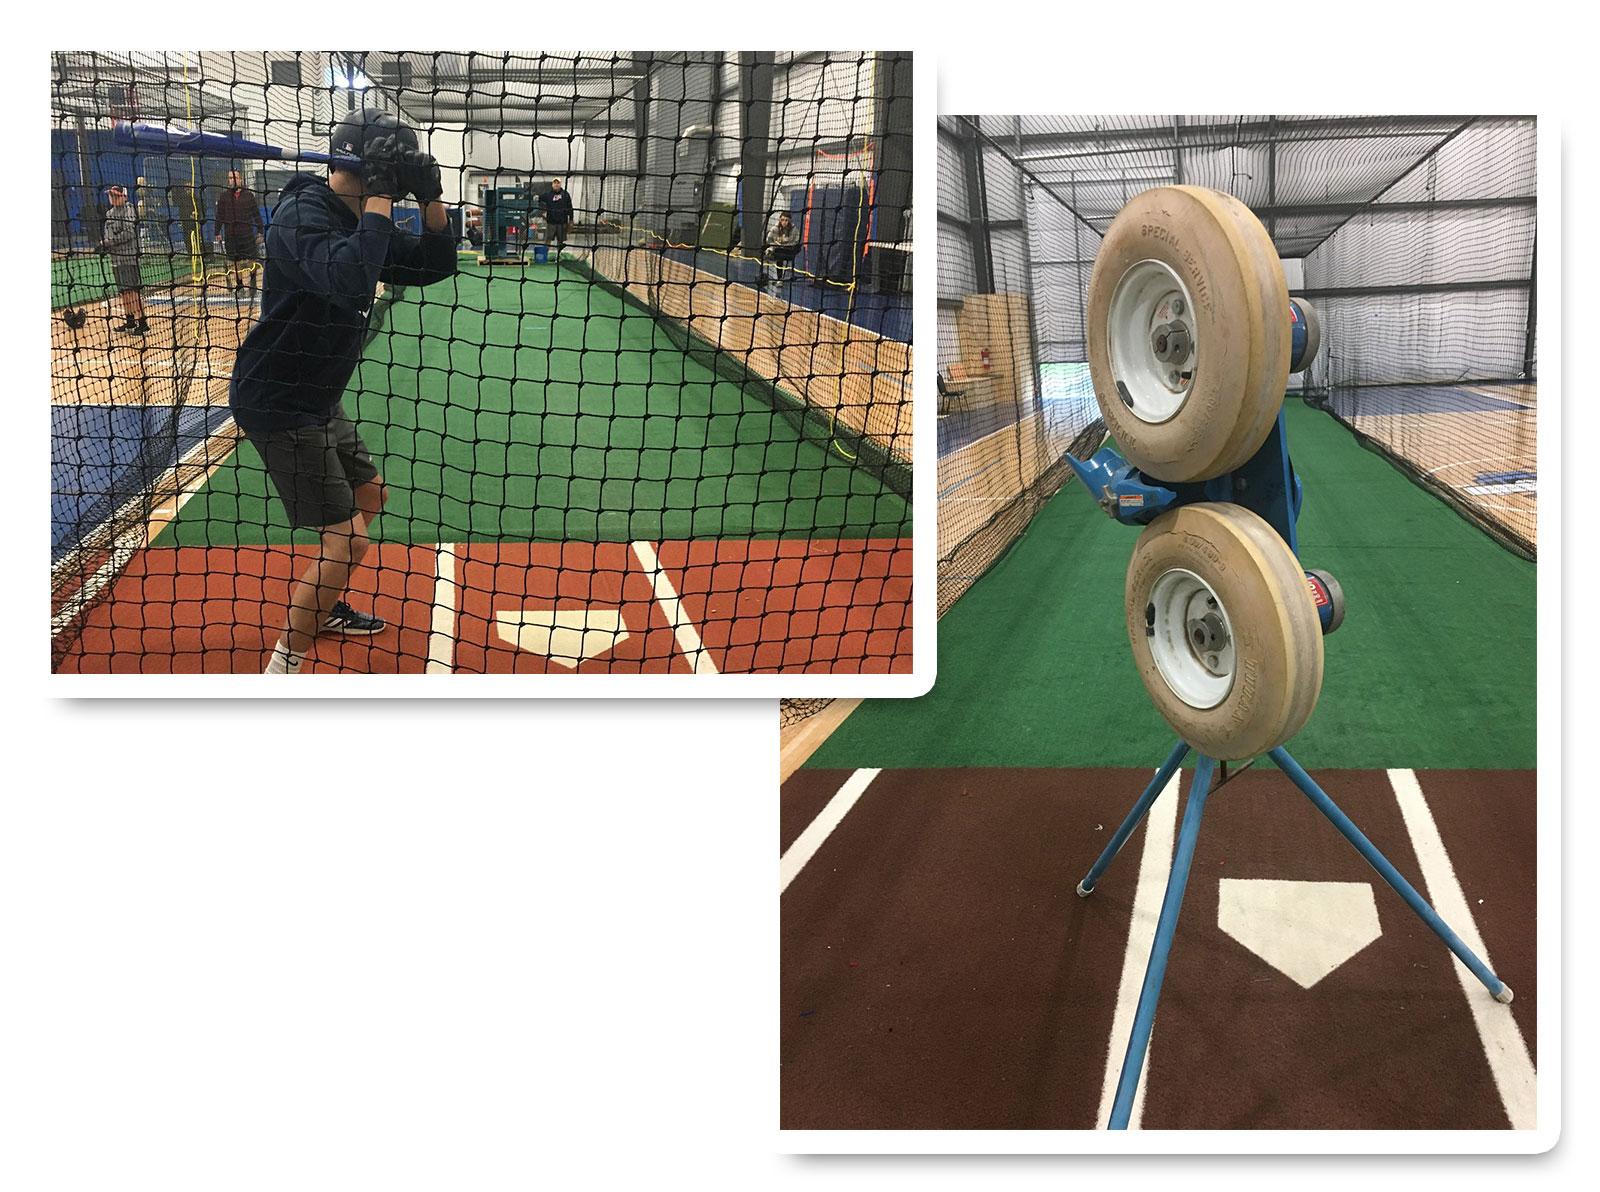 Baseball Indoor Training Facility